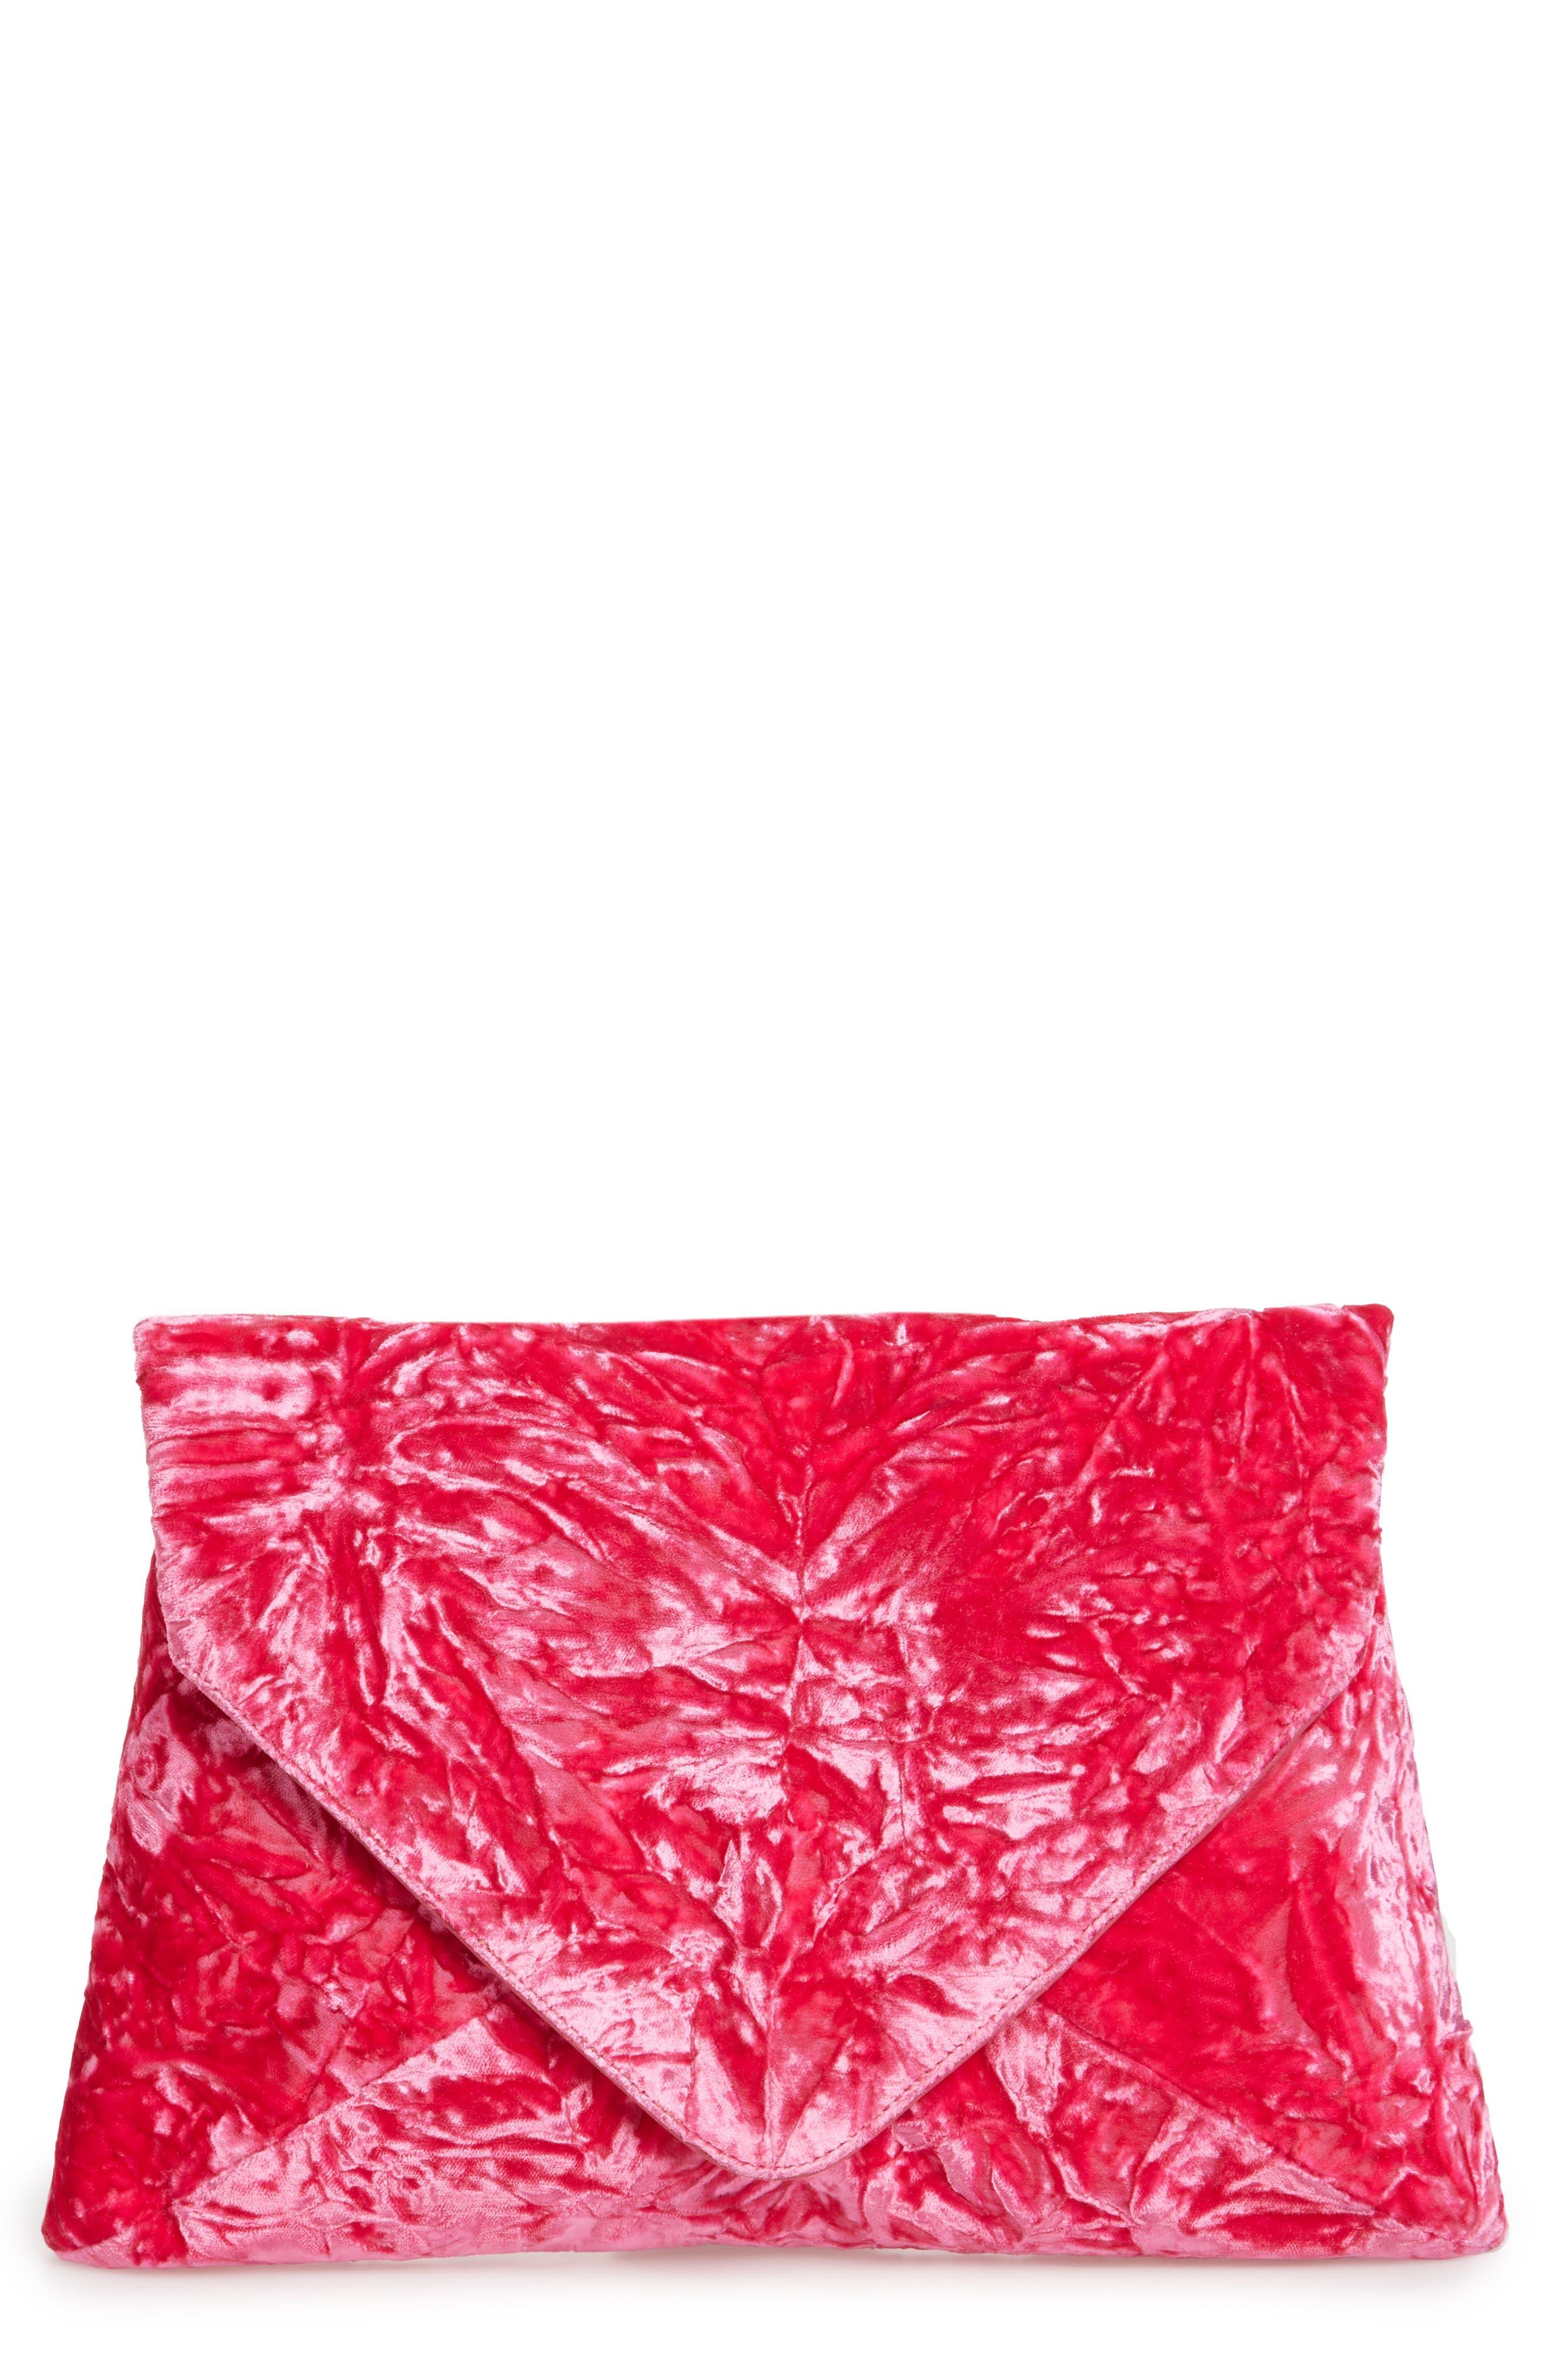 Alternate Image 1 Selected - Dries Van Noten Velvet Envelope Clutch